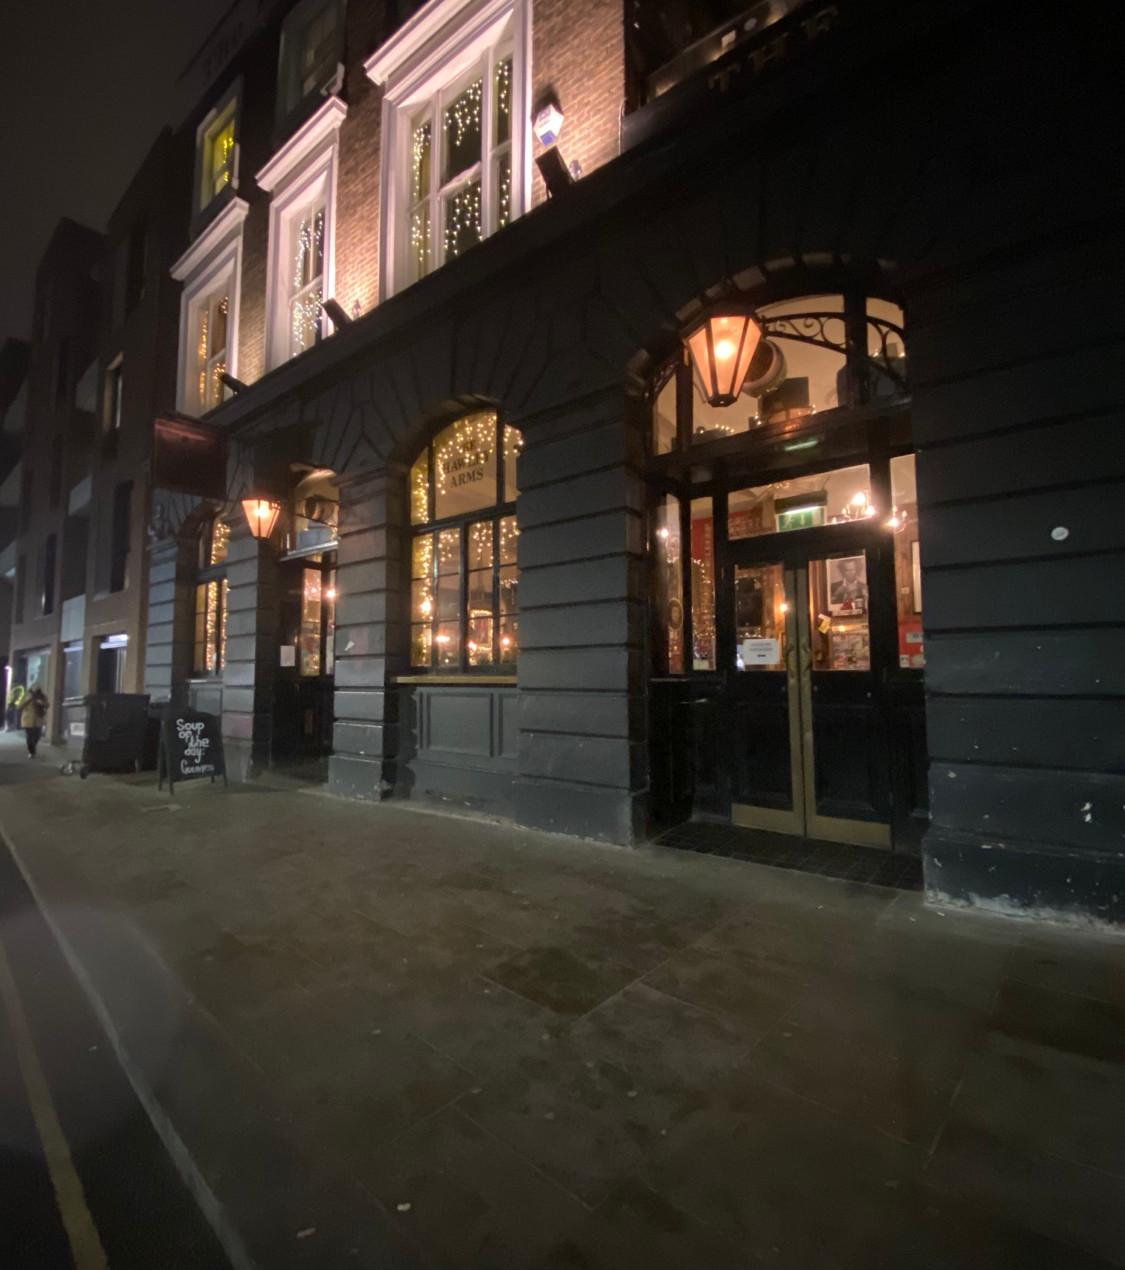 Melhores Pubs de Londres